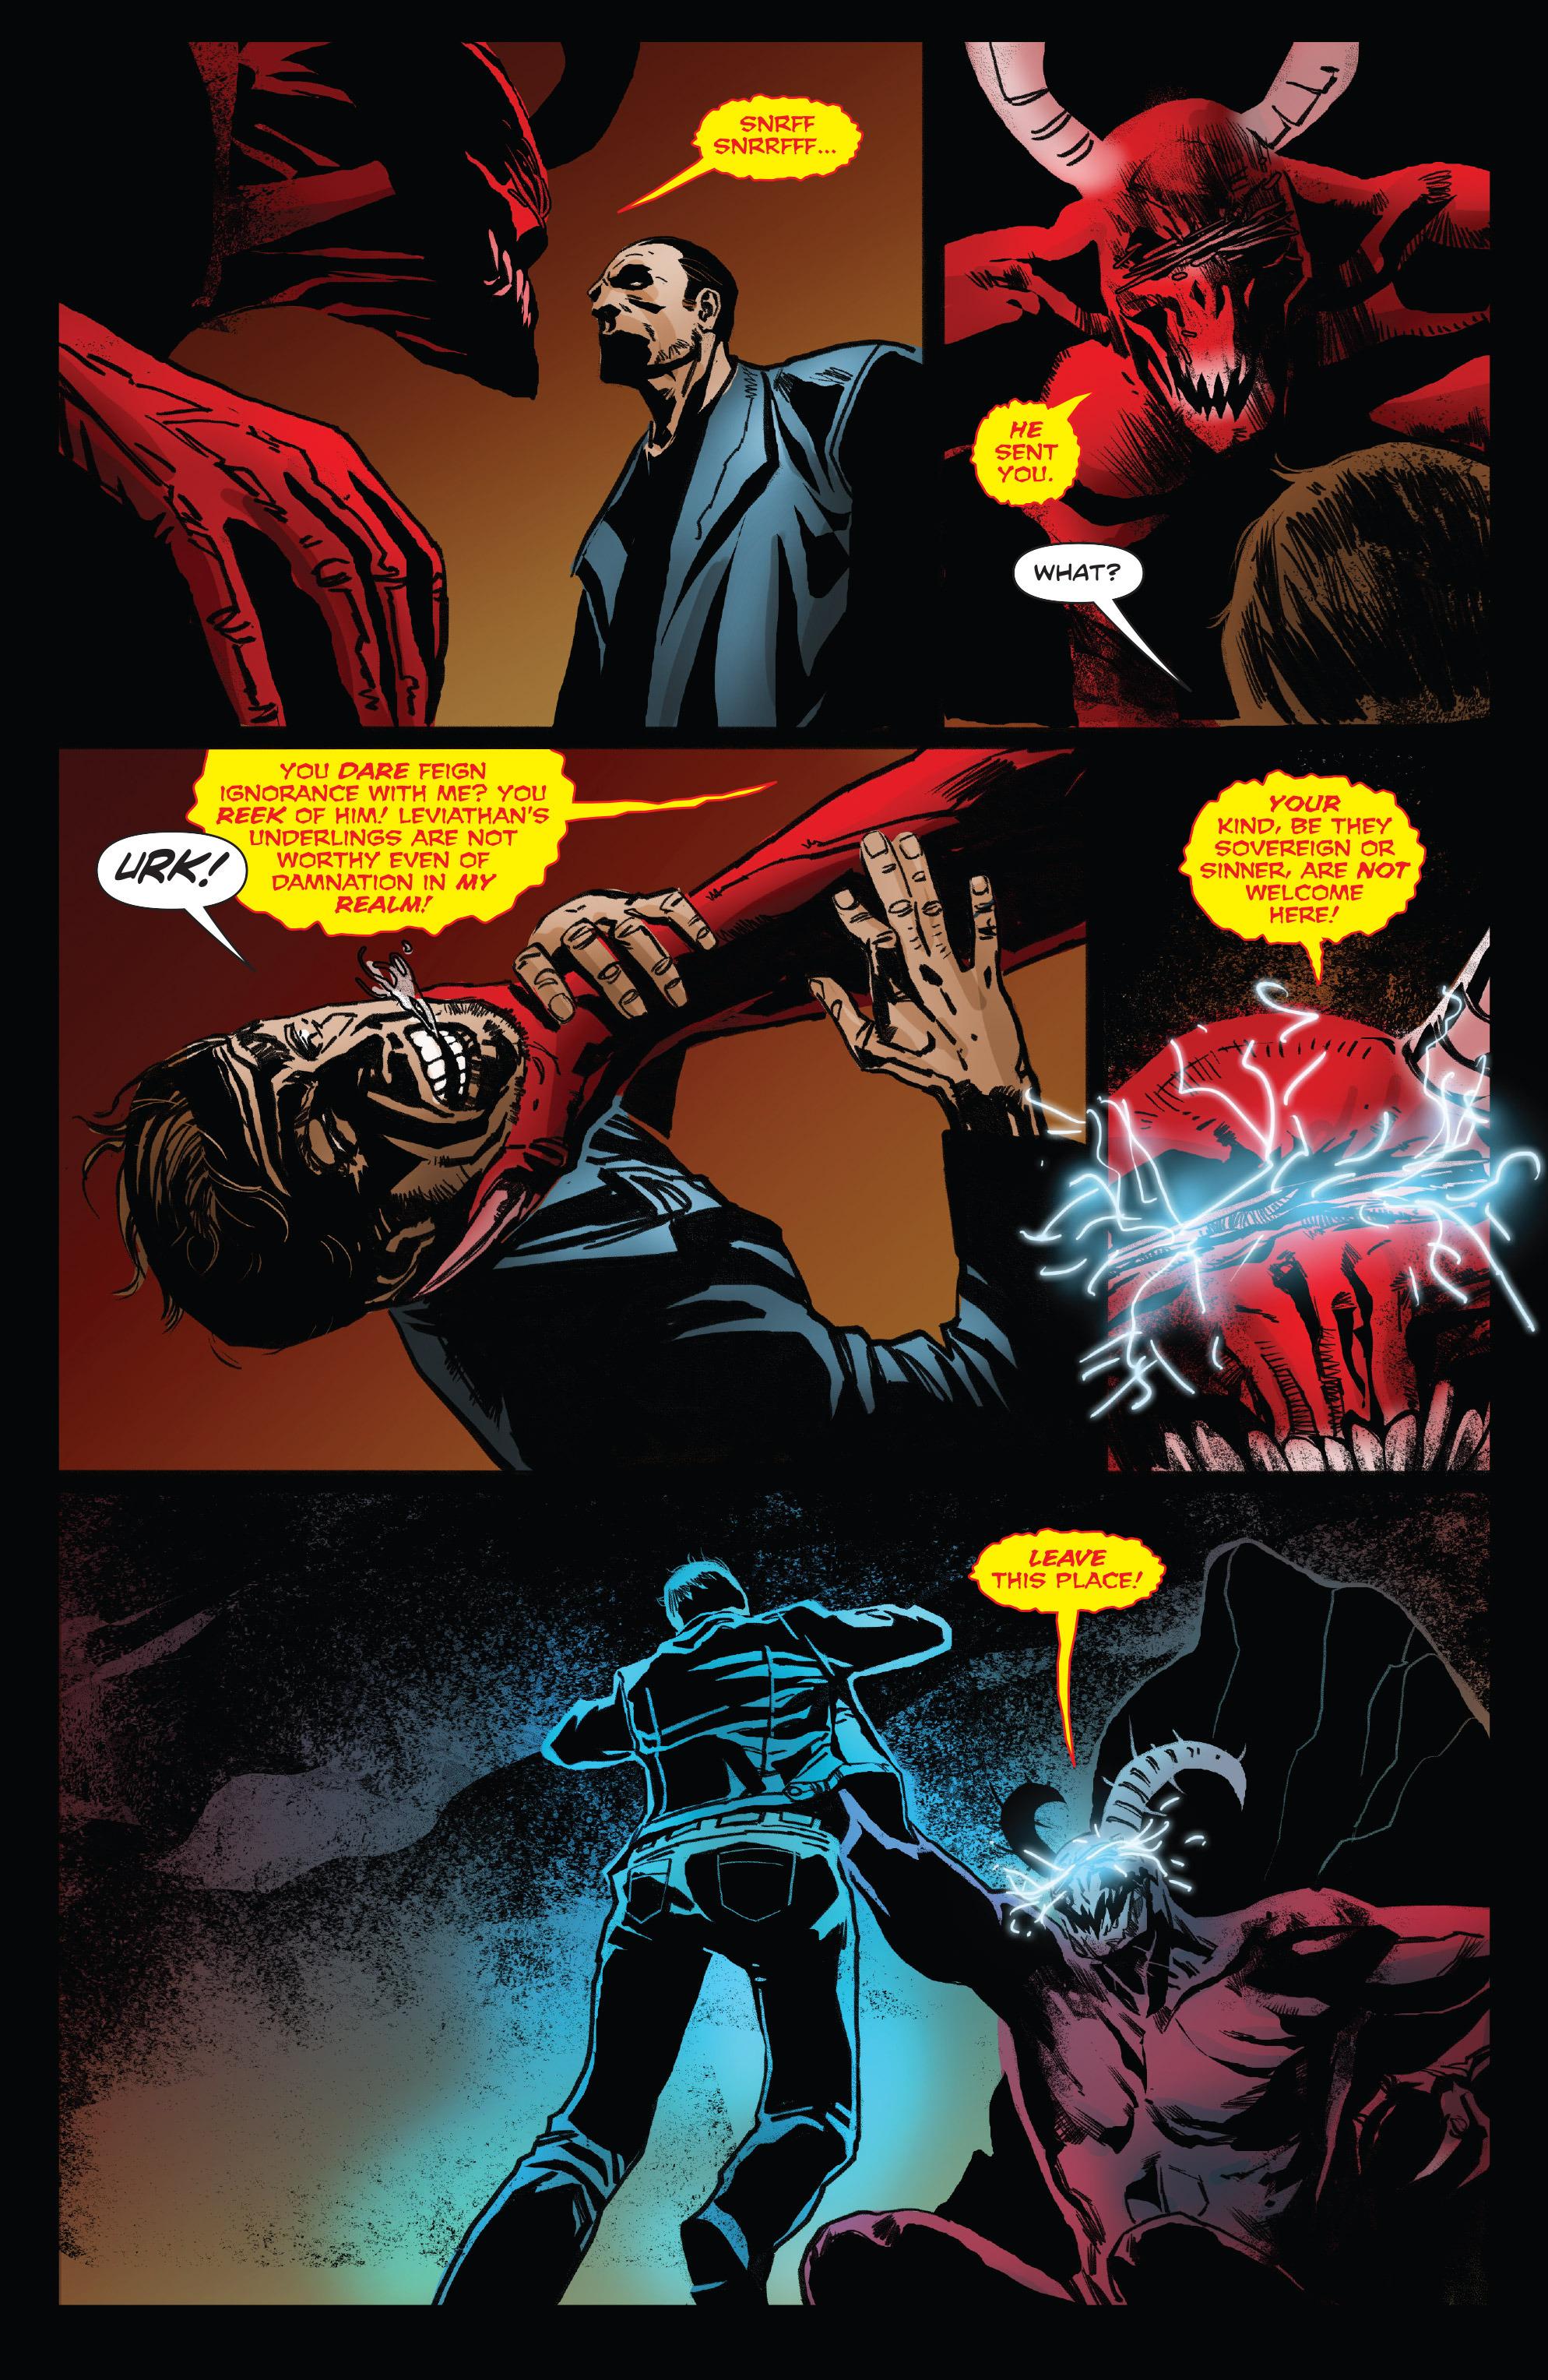 Read online Clive Barker's Hellraiser: The Dark Watch comic -  Issue # TPB 3 - 32